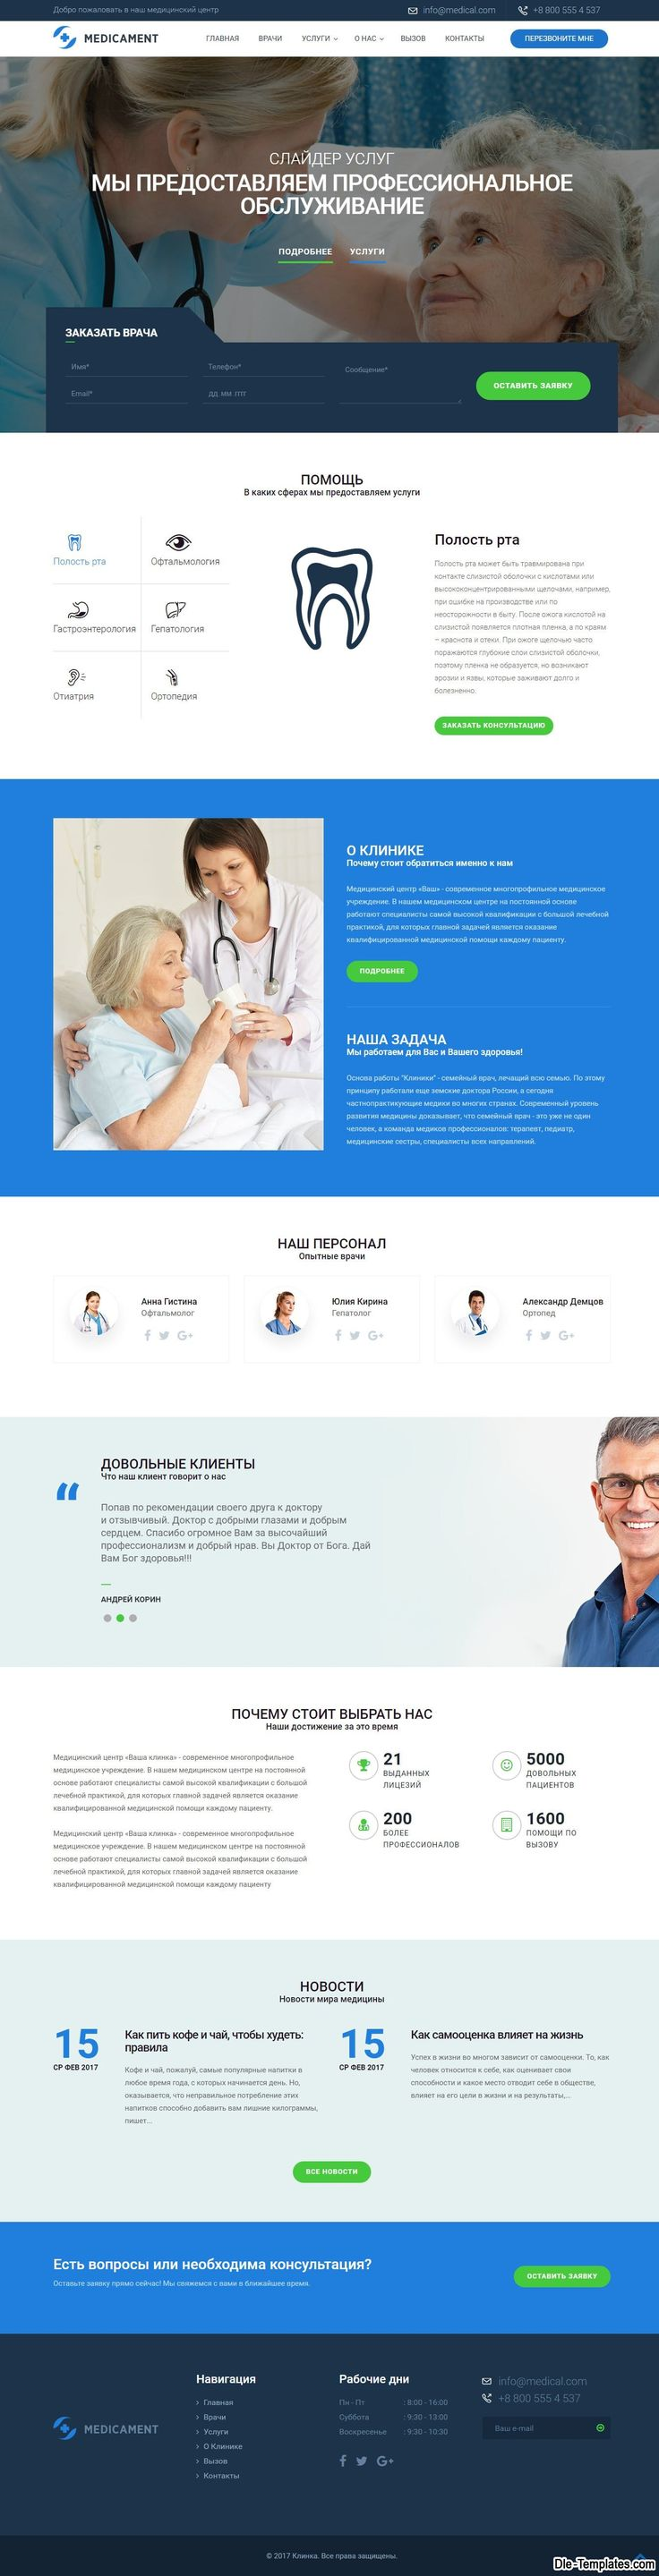 Medicament - шаблон для медицинского сайта на DLE #templates #website #шаблон #сайт #web